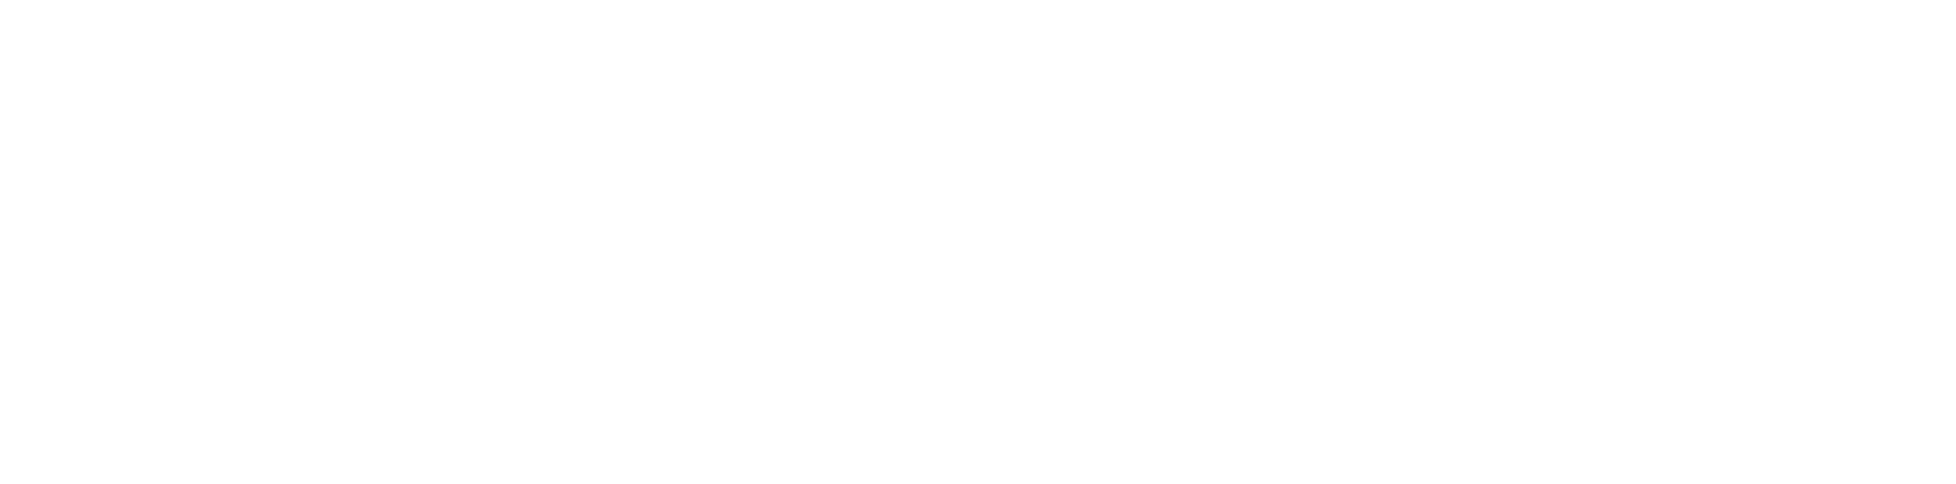 Эль Стиль